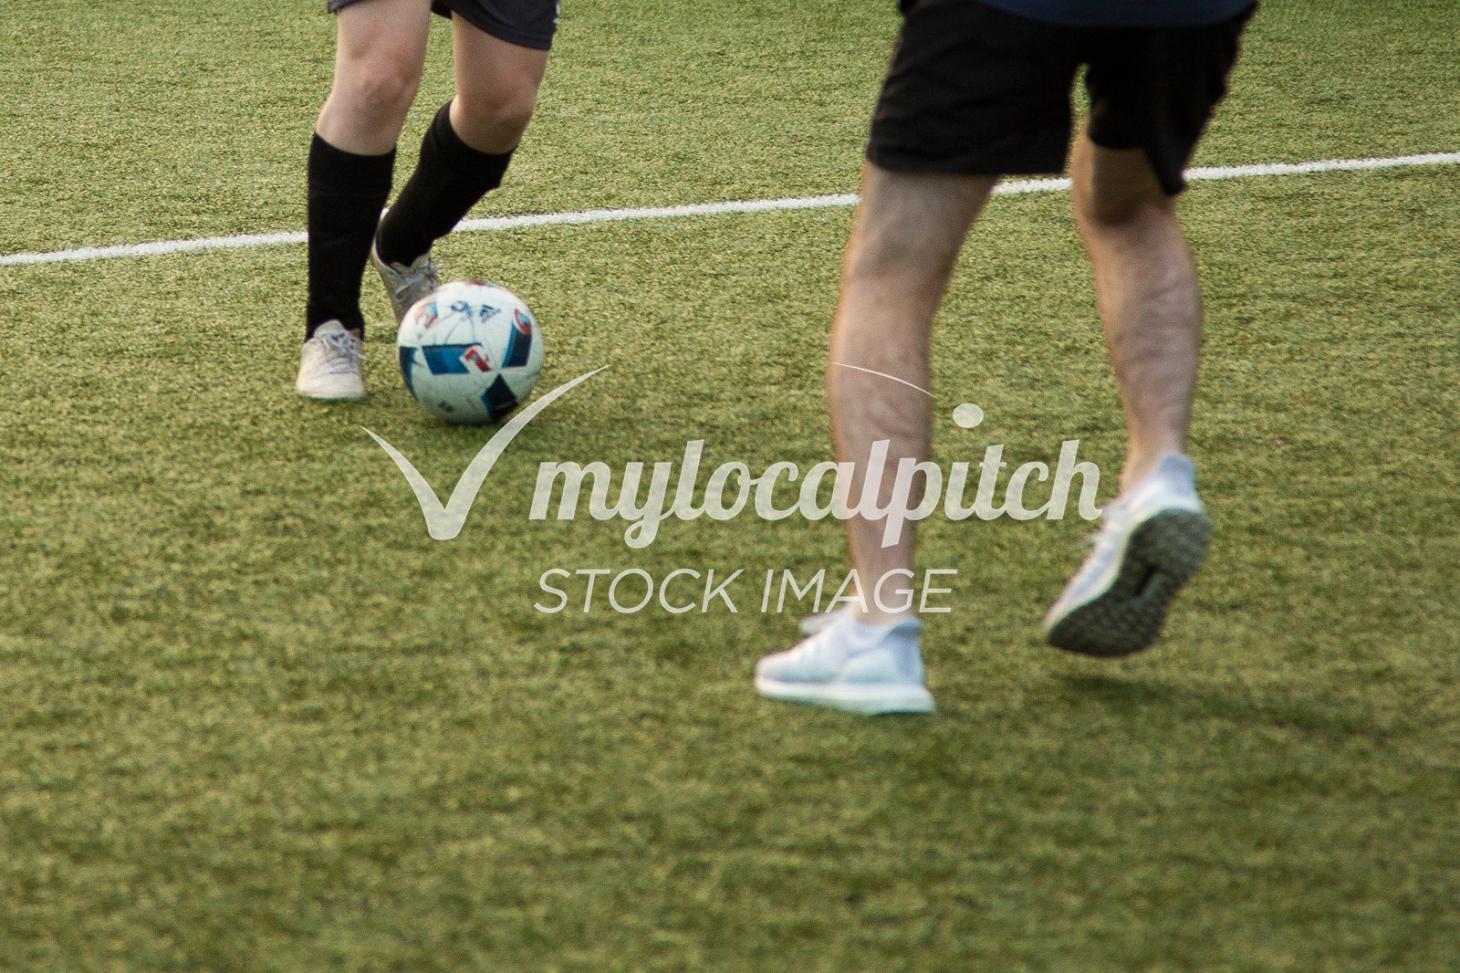 Southborough High School 5 a side | 3G Astroturf football pitch